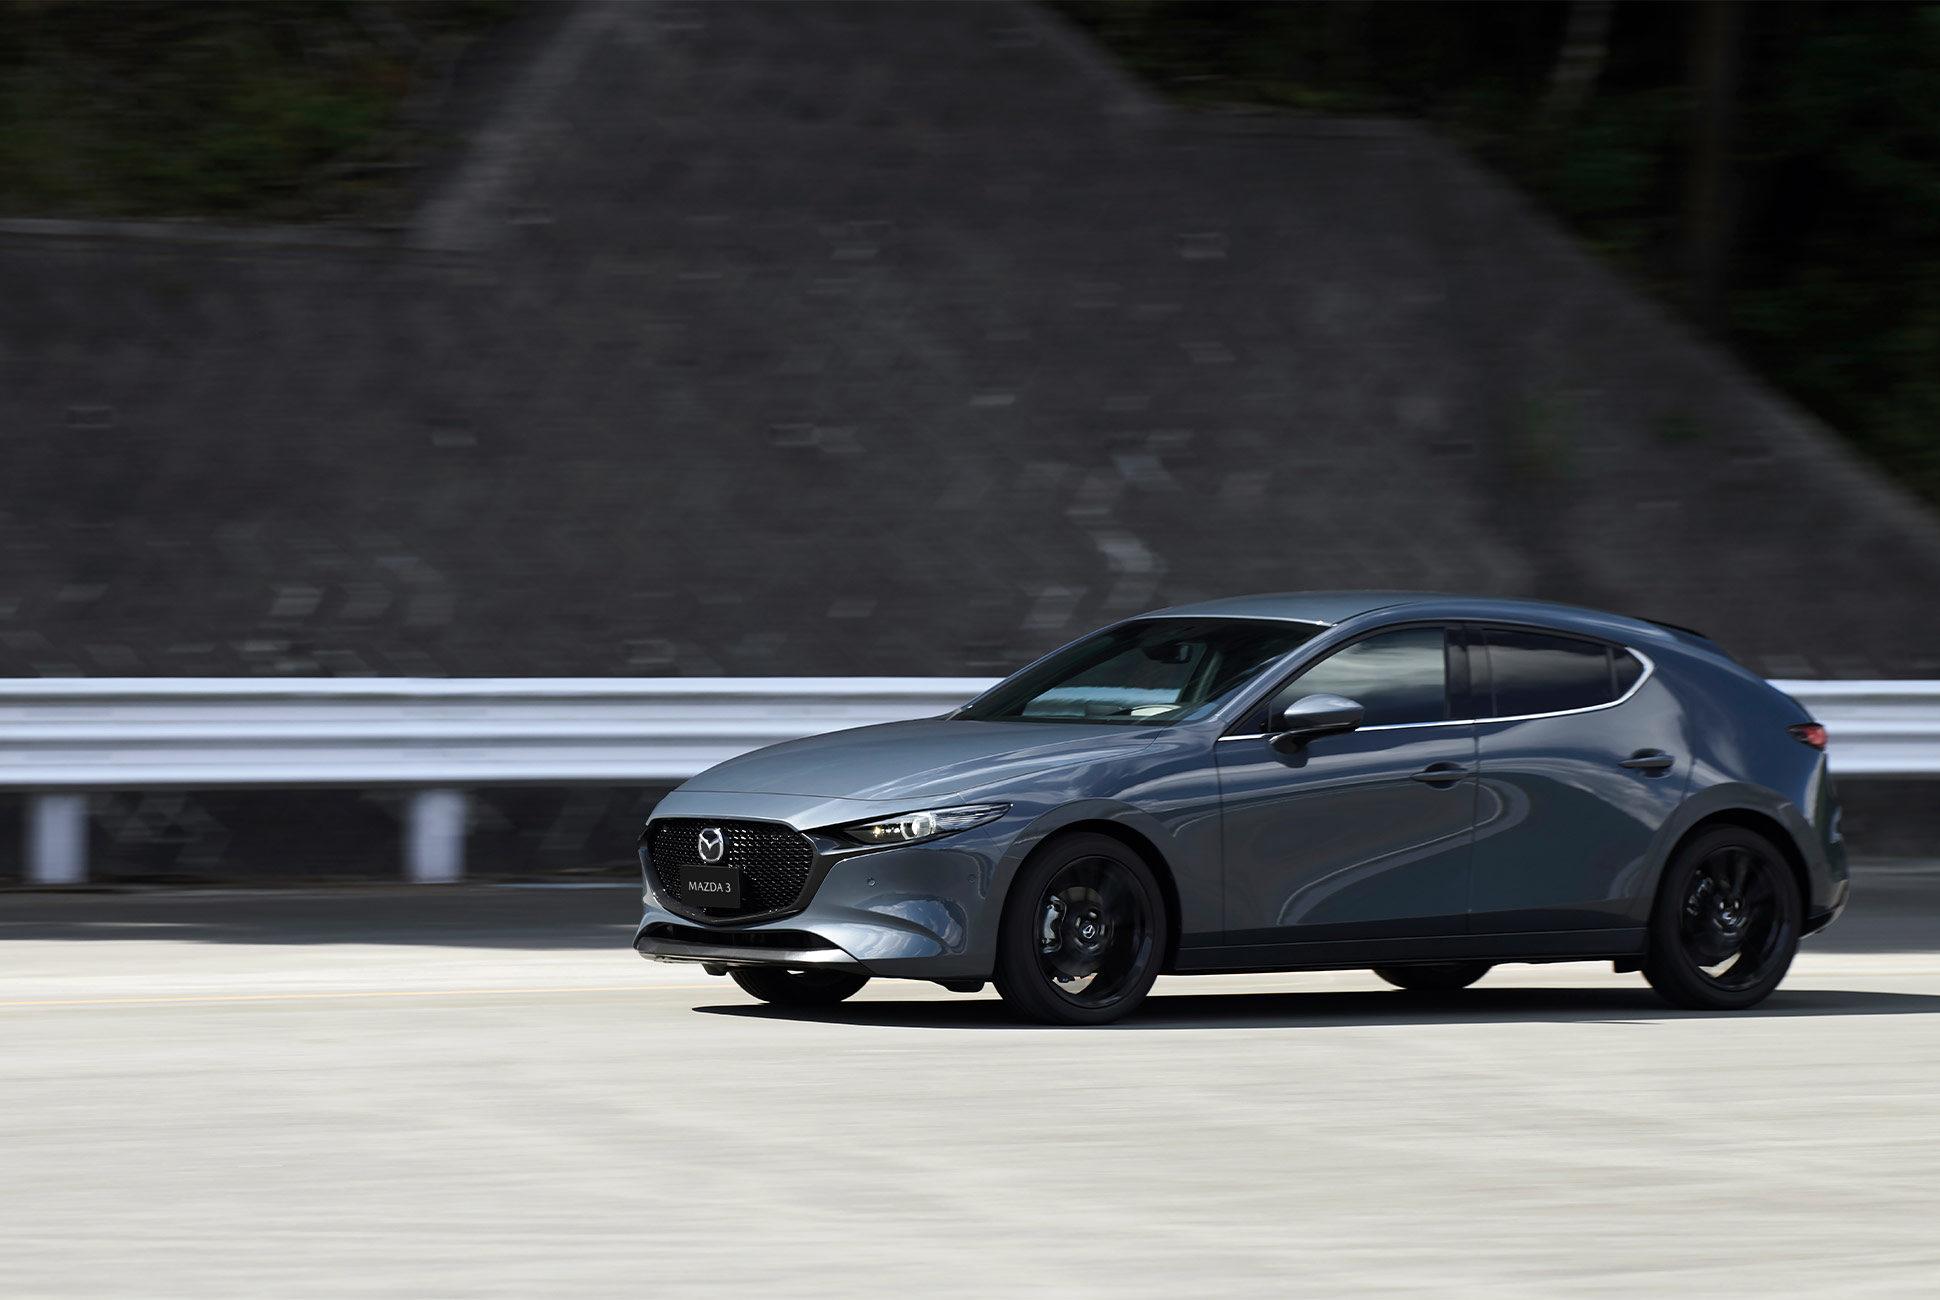 2018 - [Mazda] 3 IV - Page 11 Next-g10